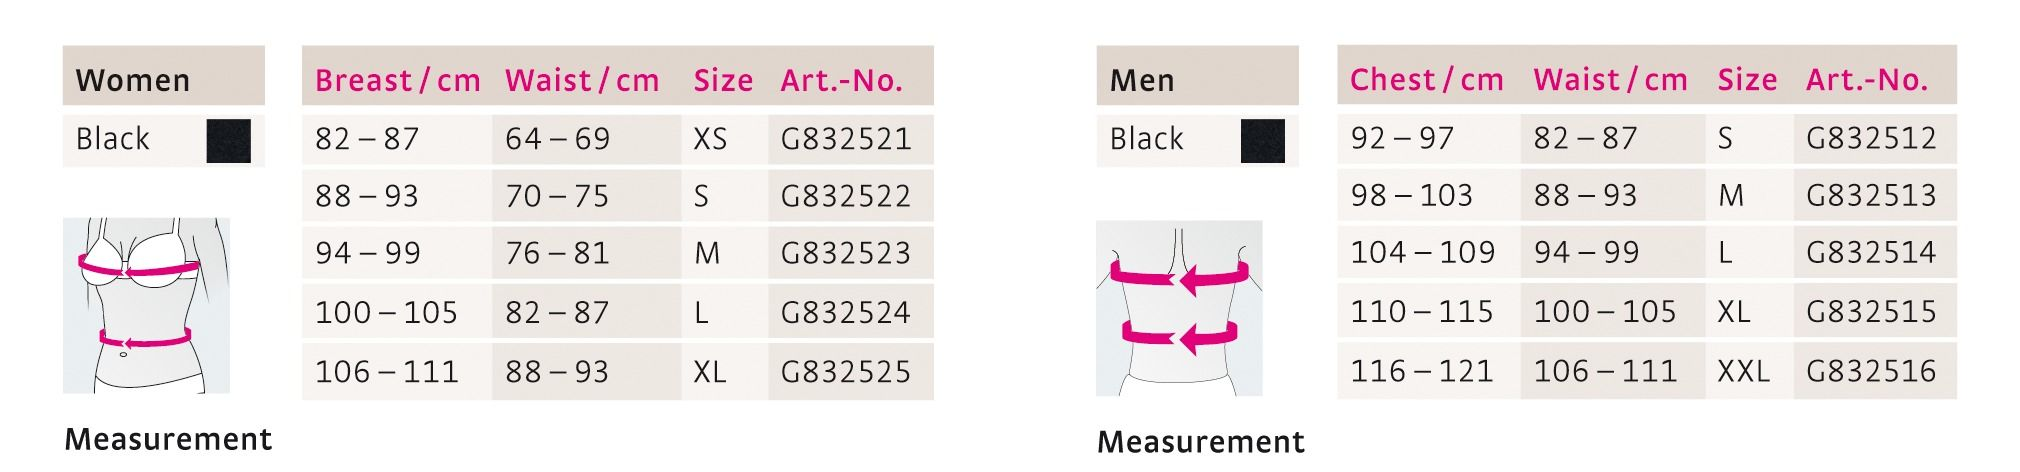 medi posture plus comfort size chart